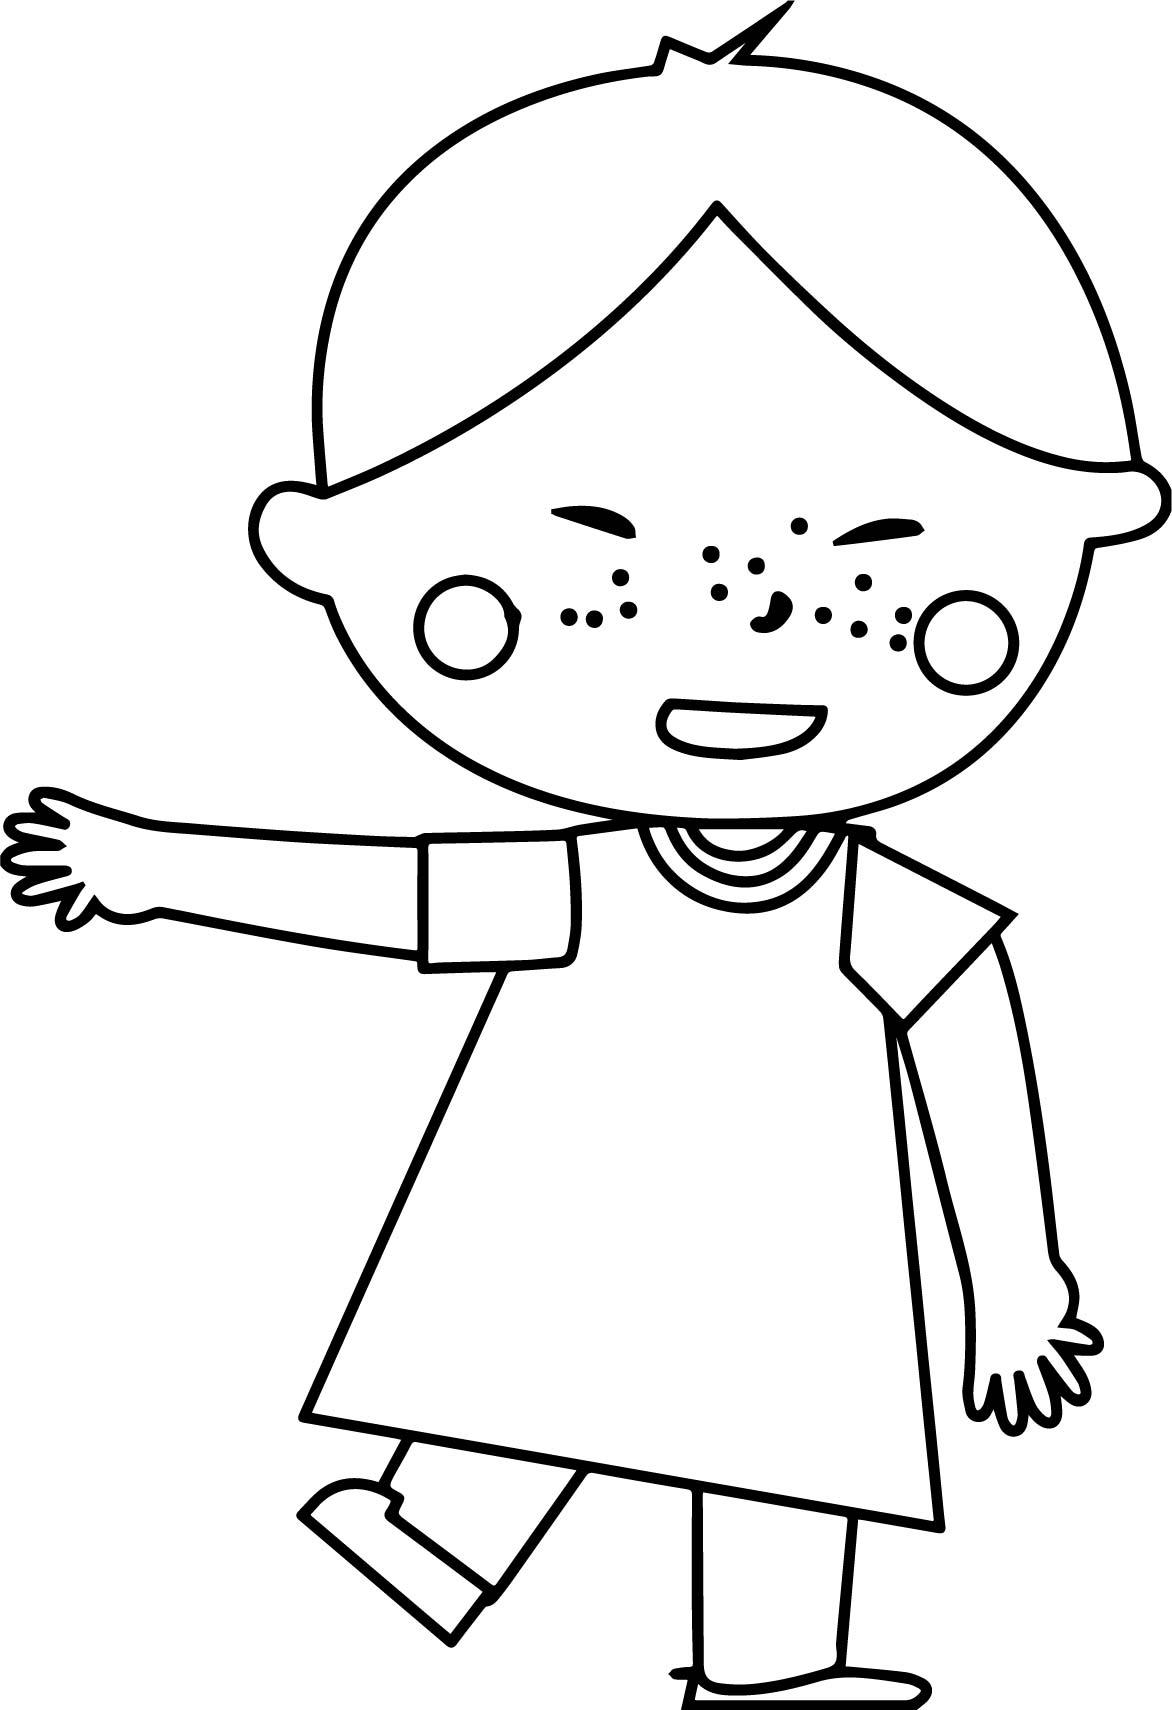 Child Boy China Coloring Page Wecoloringpage Com